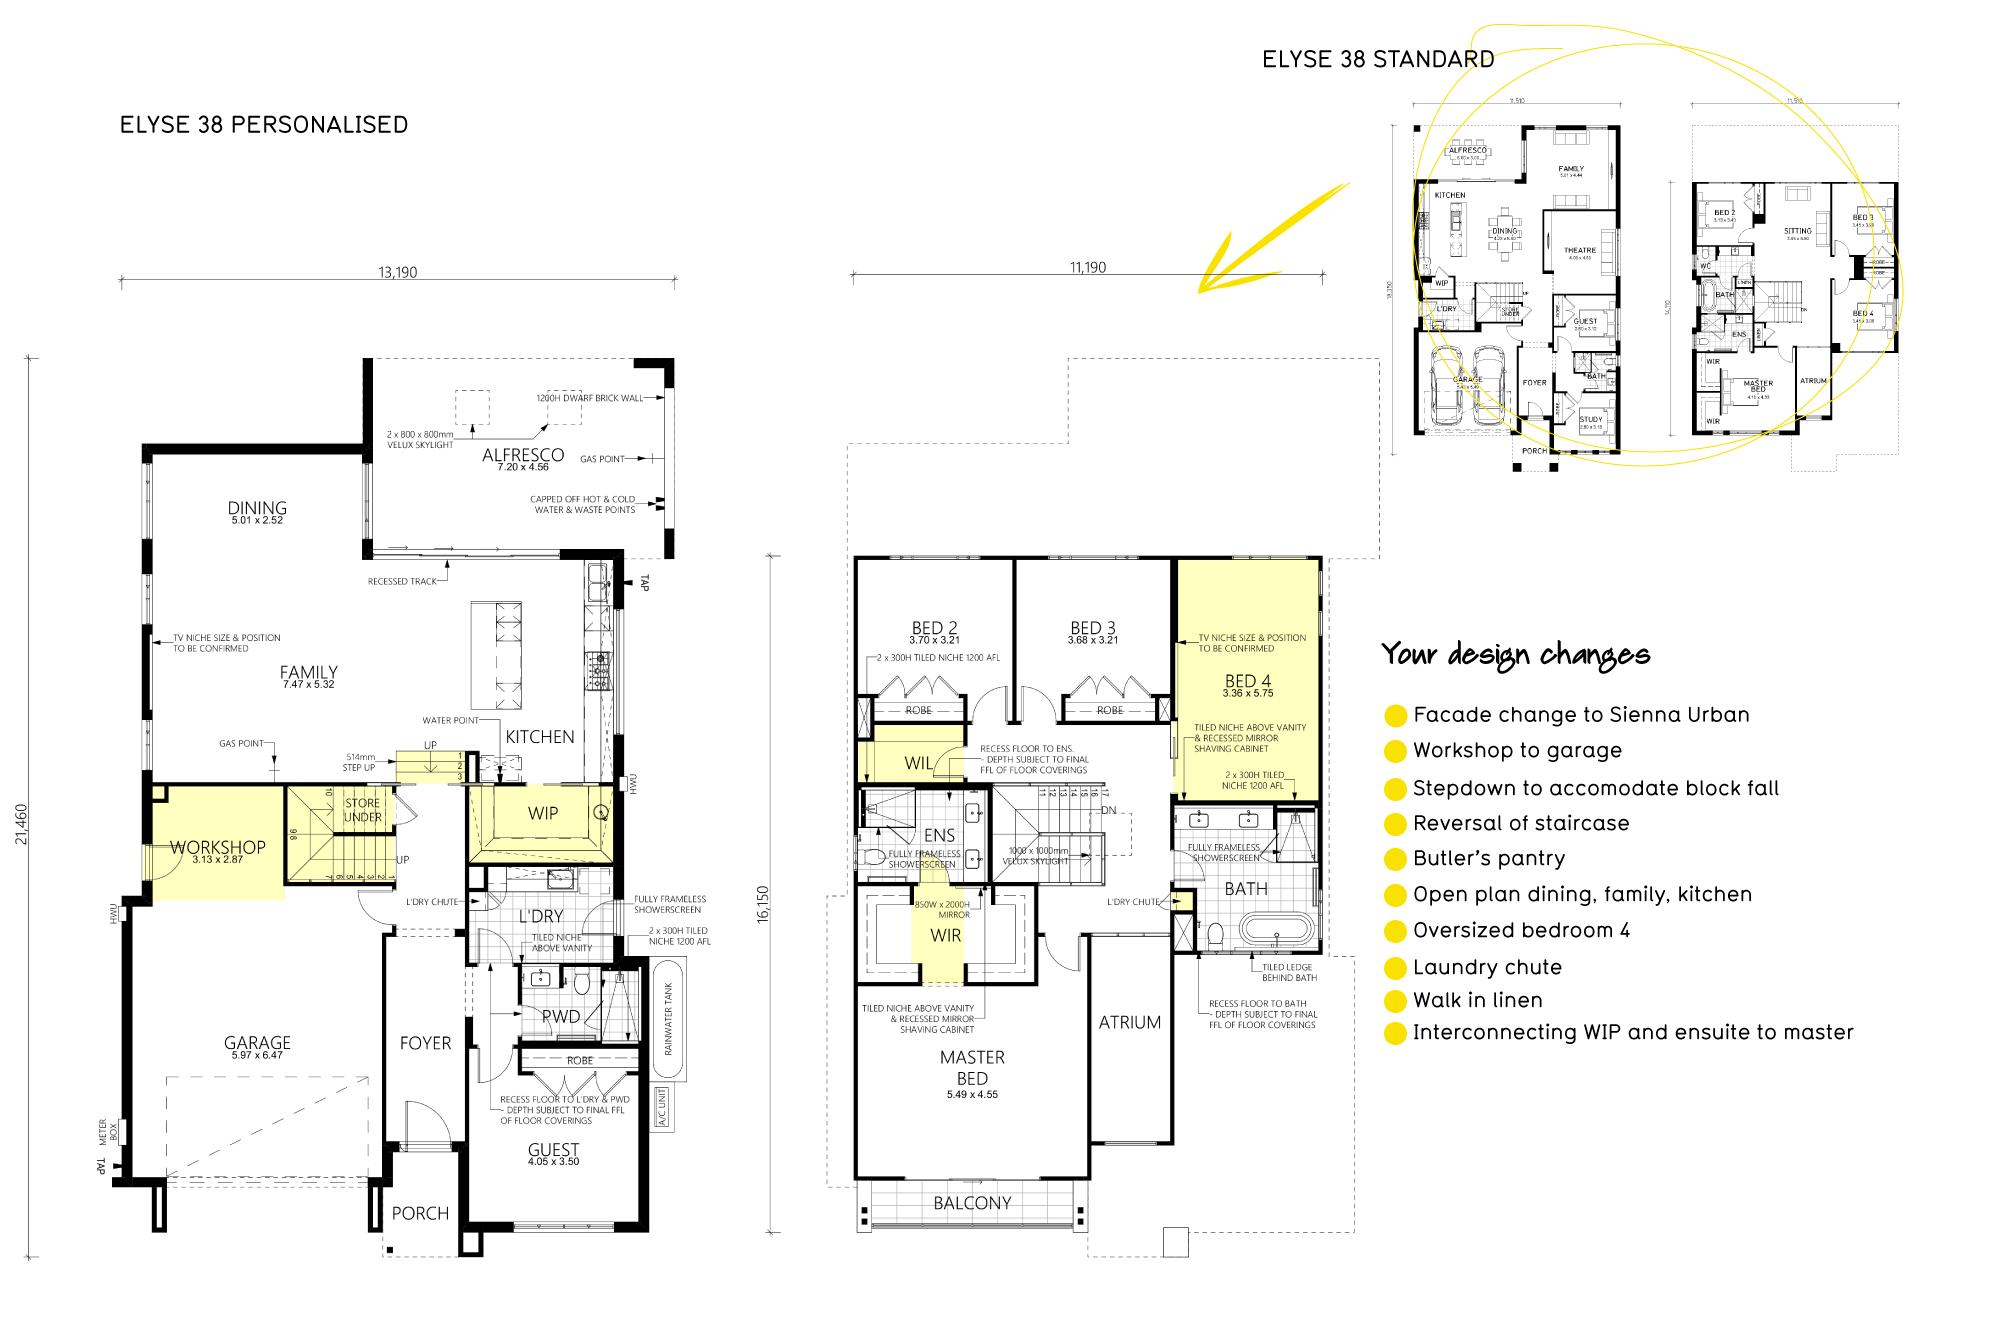 hallharthomes-customisation-personalised-design-approach-004